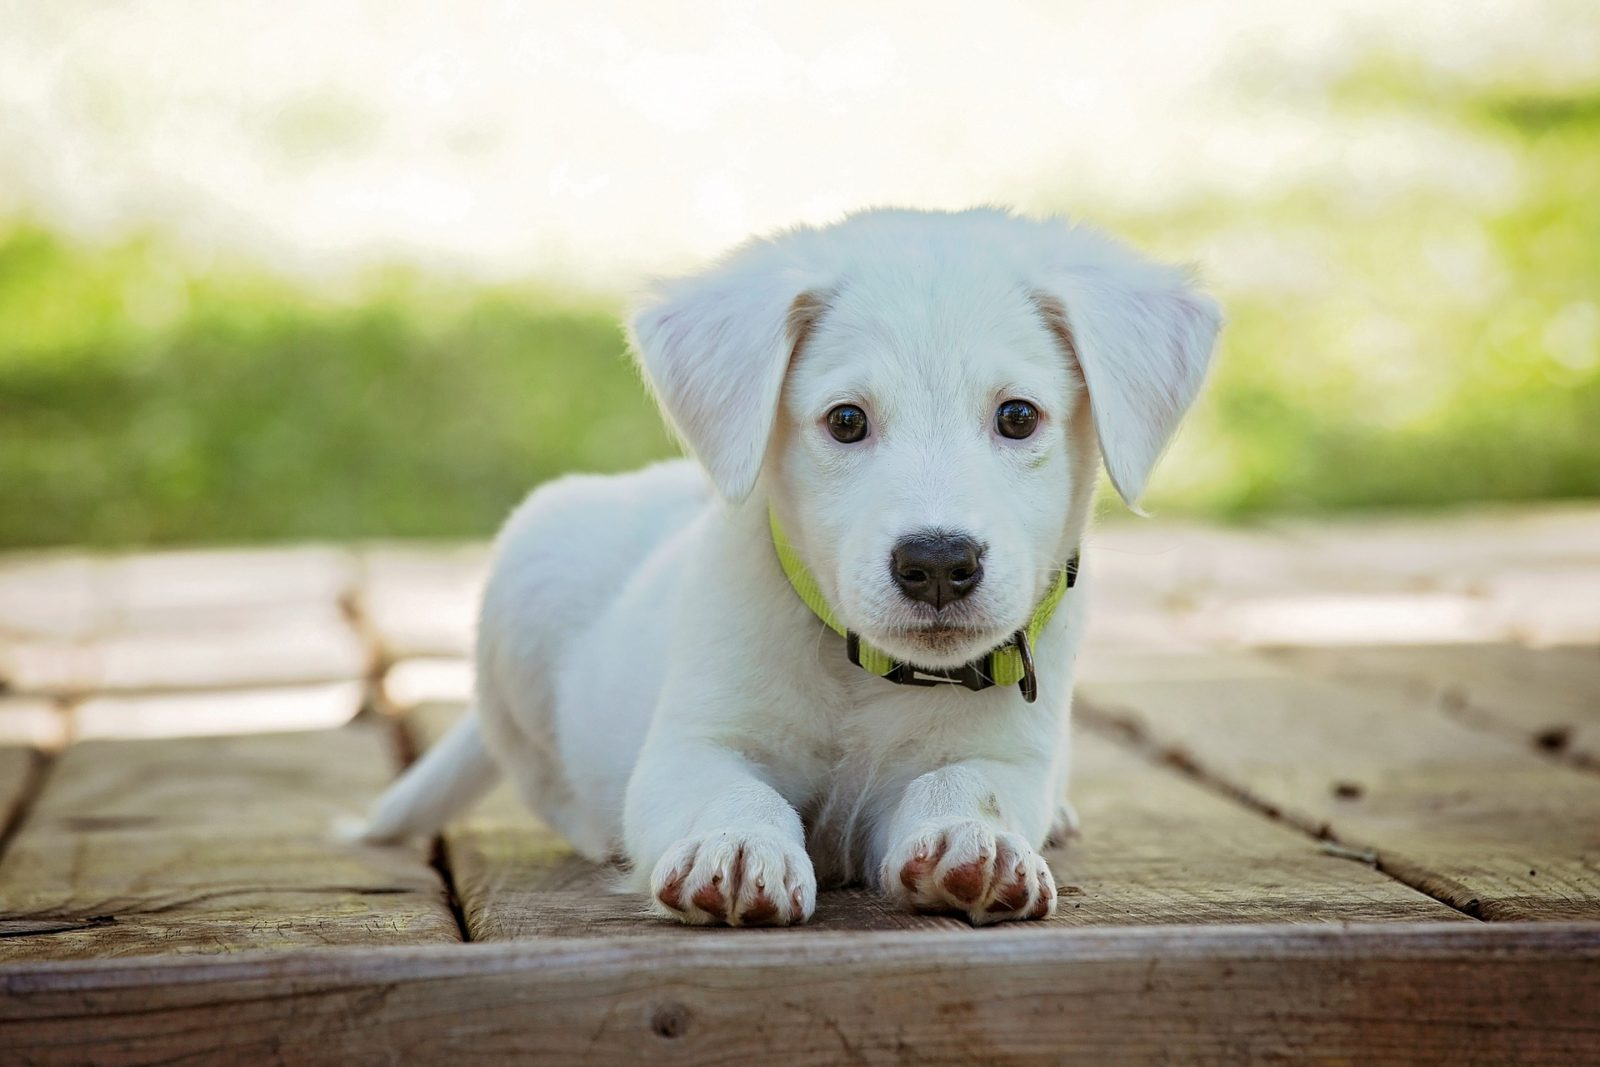 cute-Puppy-my-first-pomeranian-